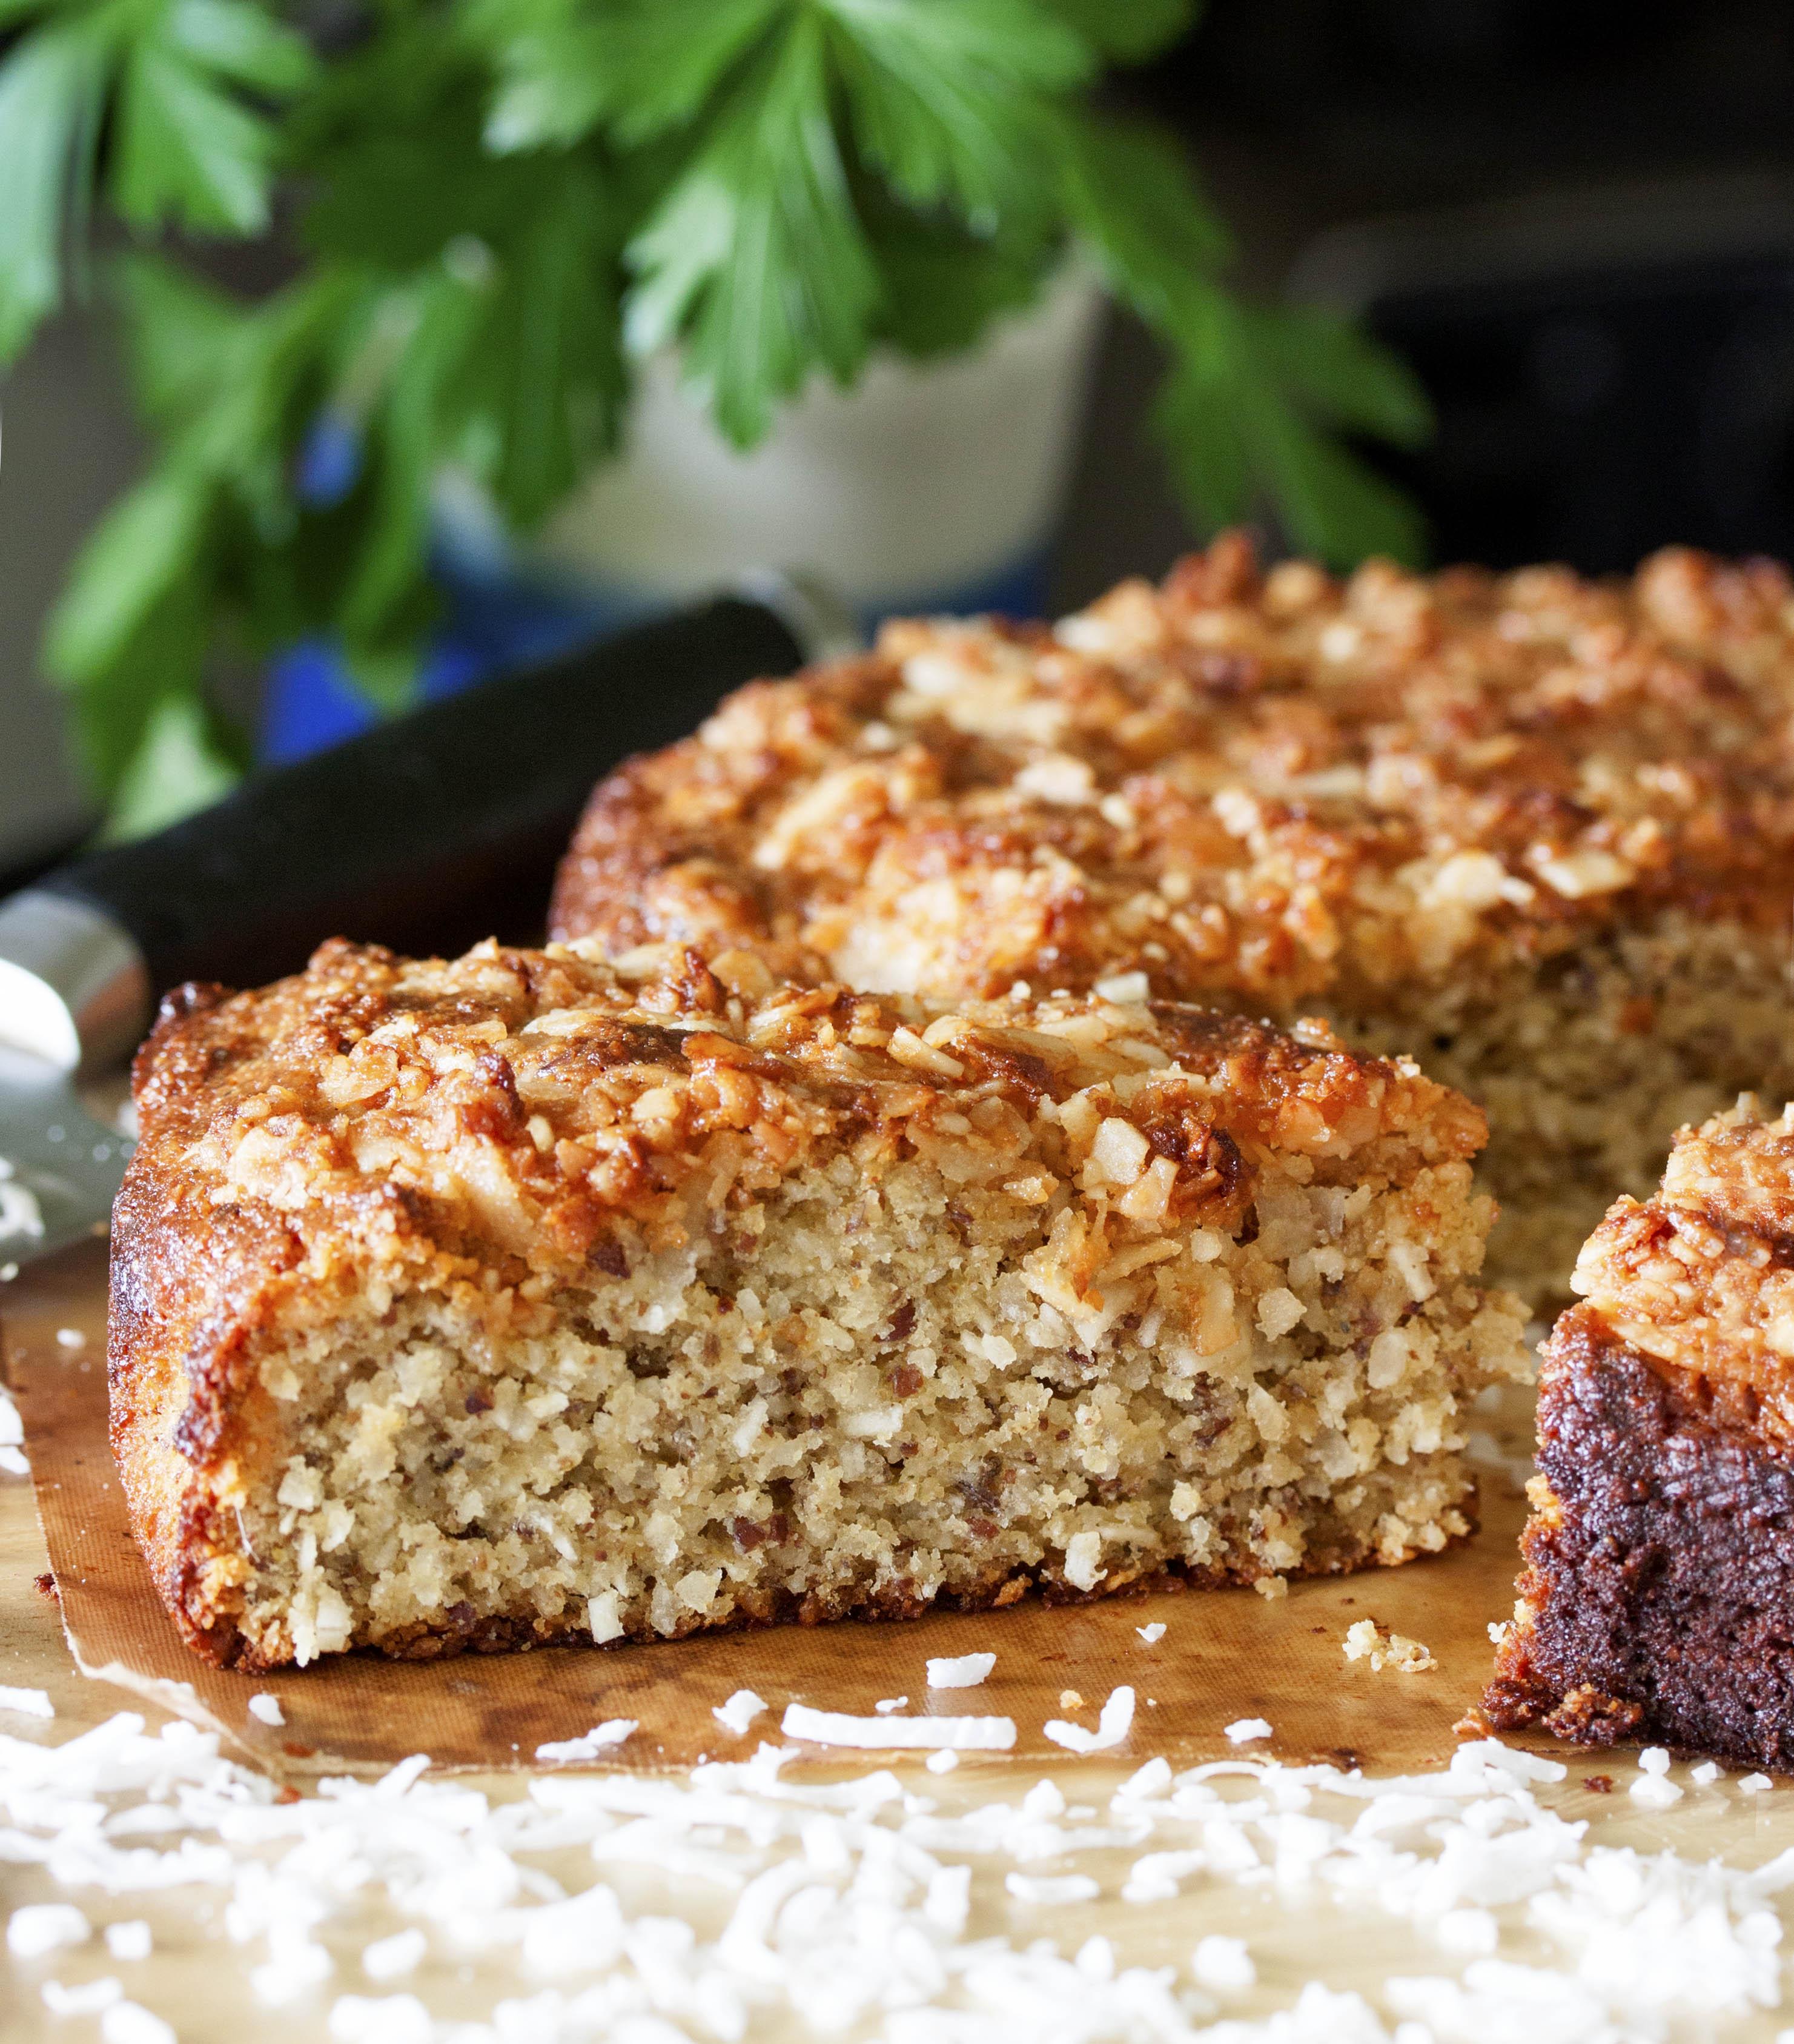 Coconut Crunch Cake